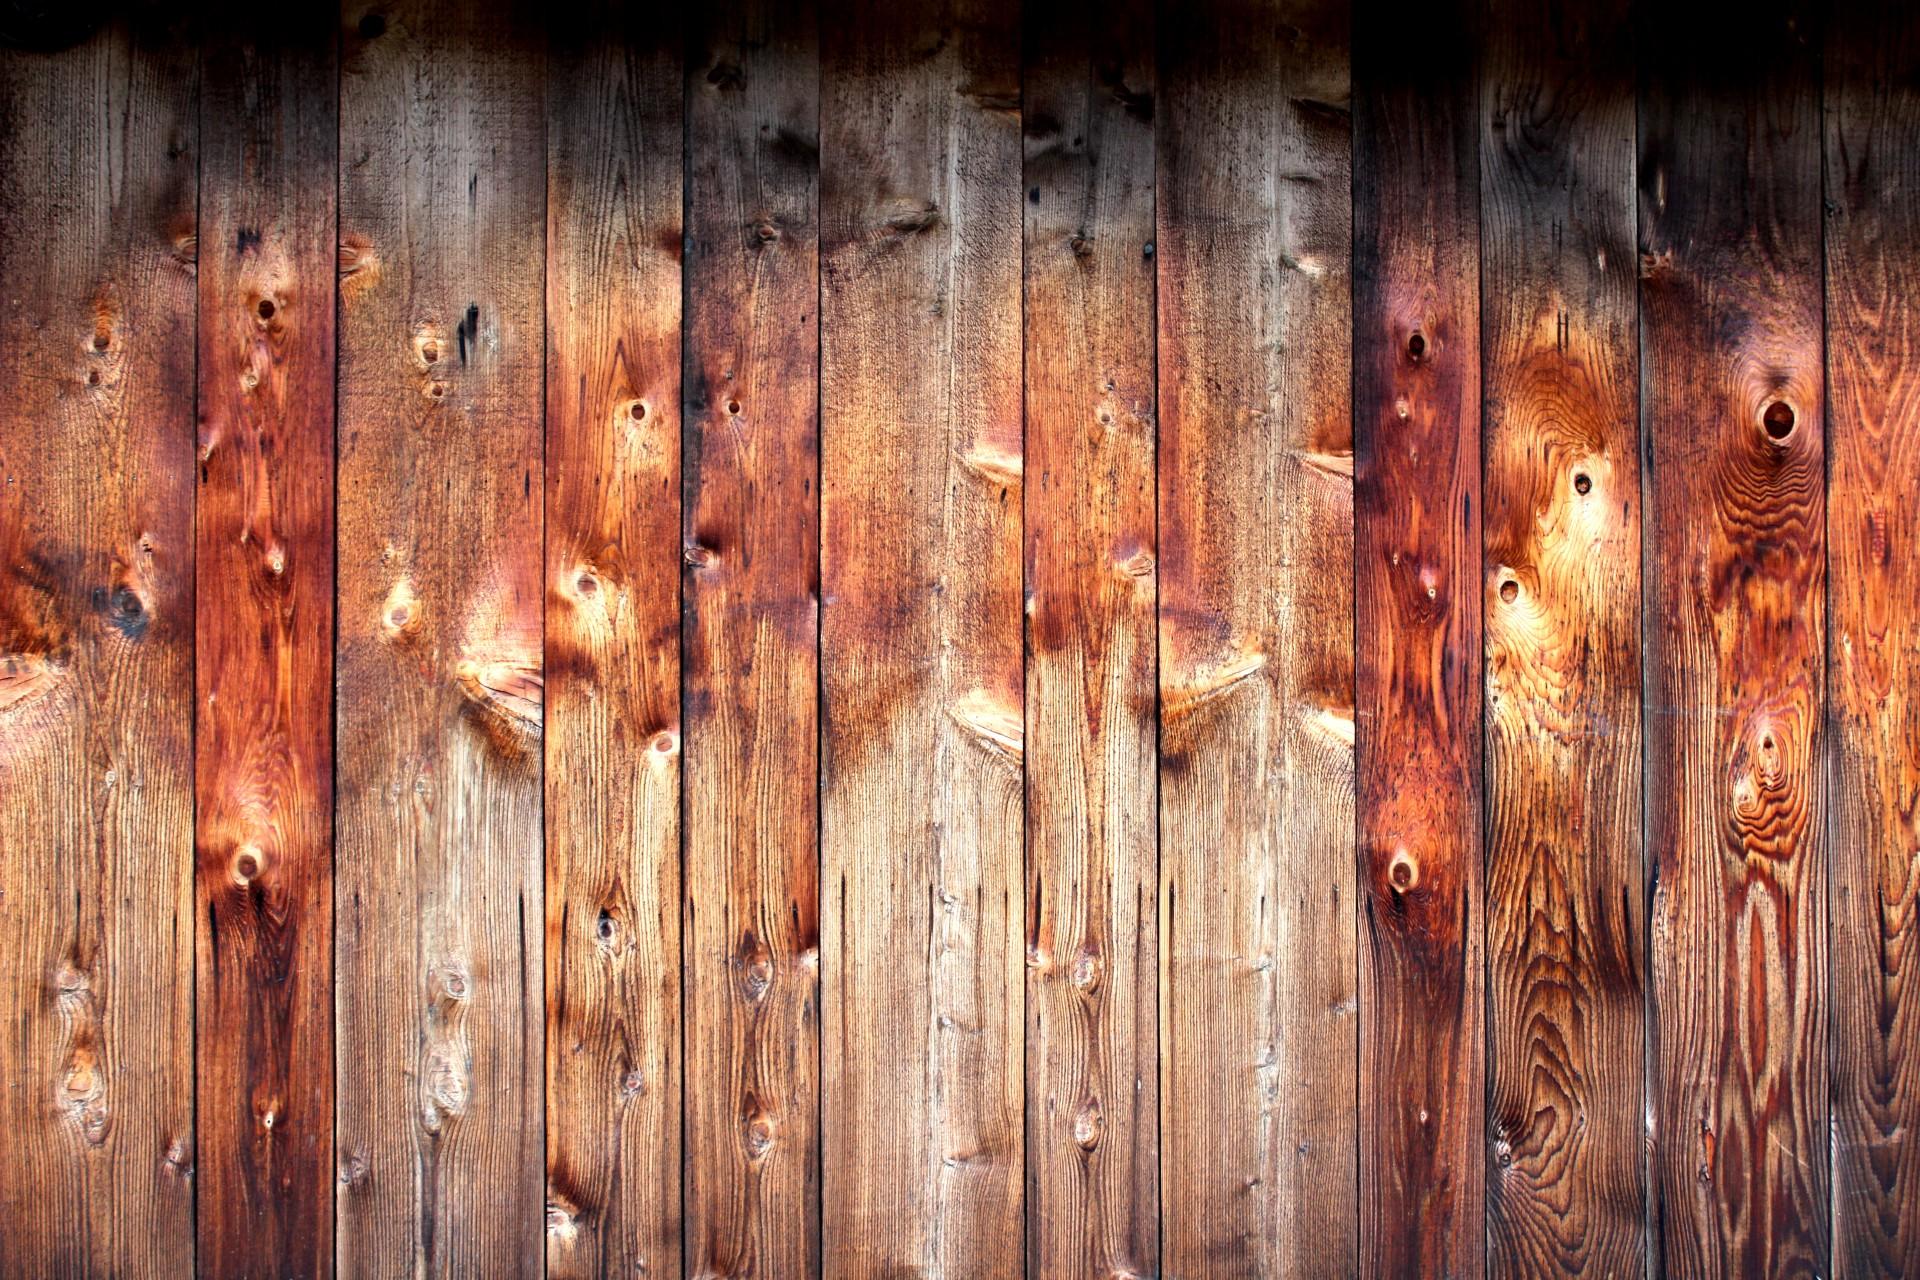 Rustic Barn Wood Background 1920x1280